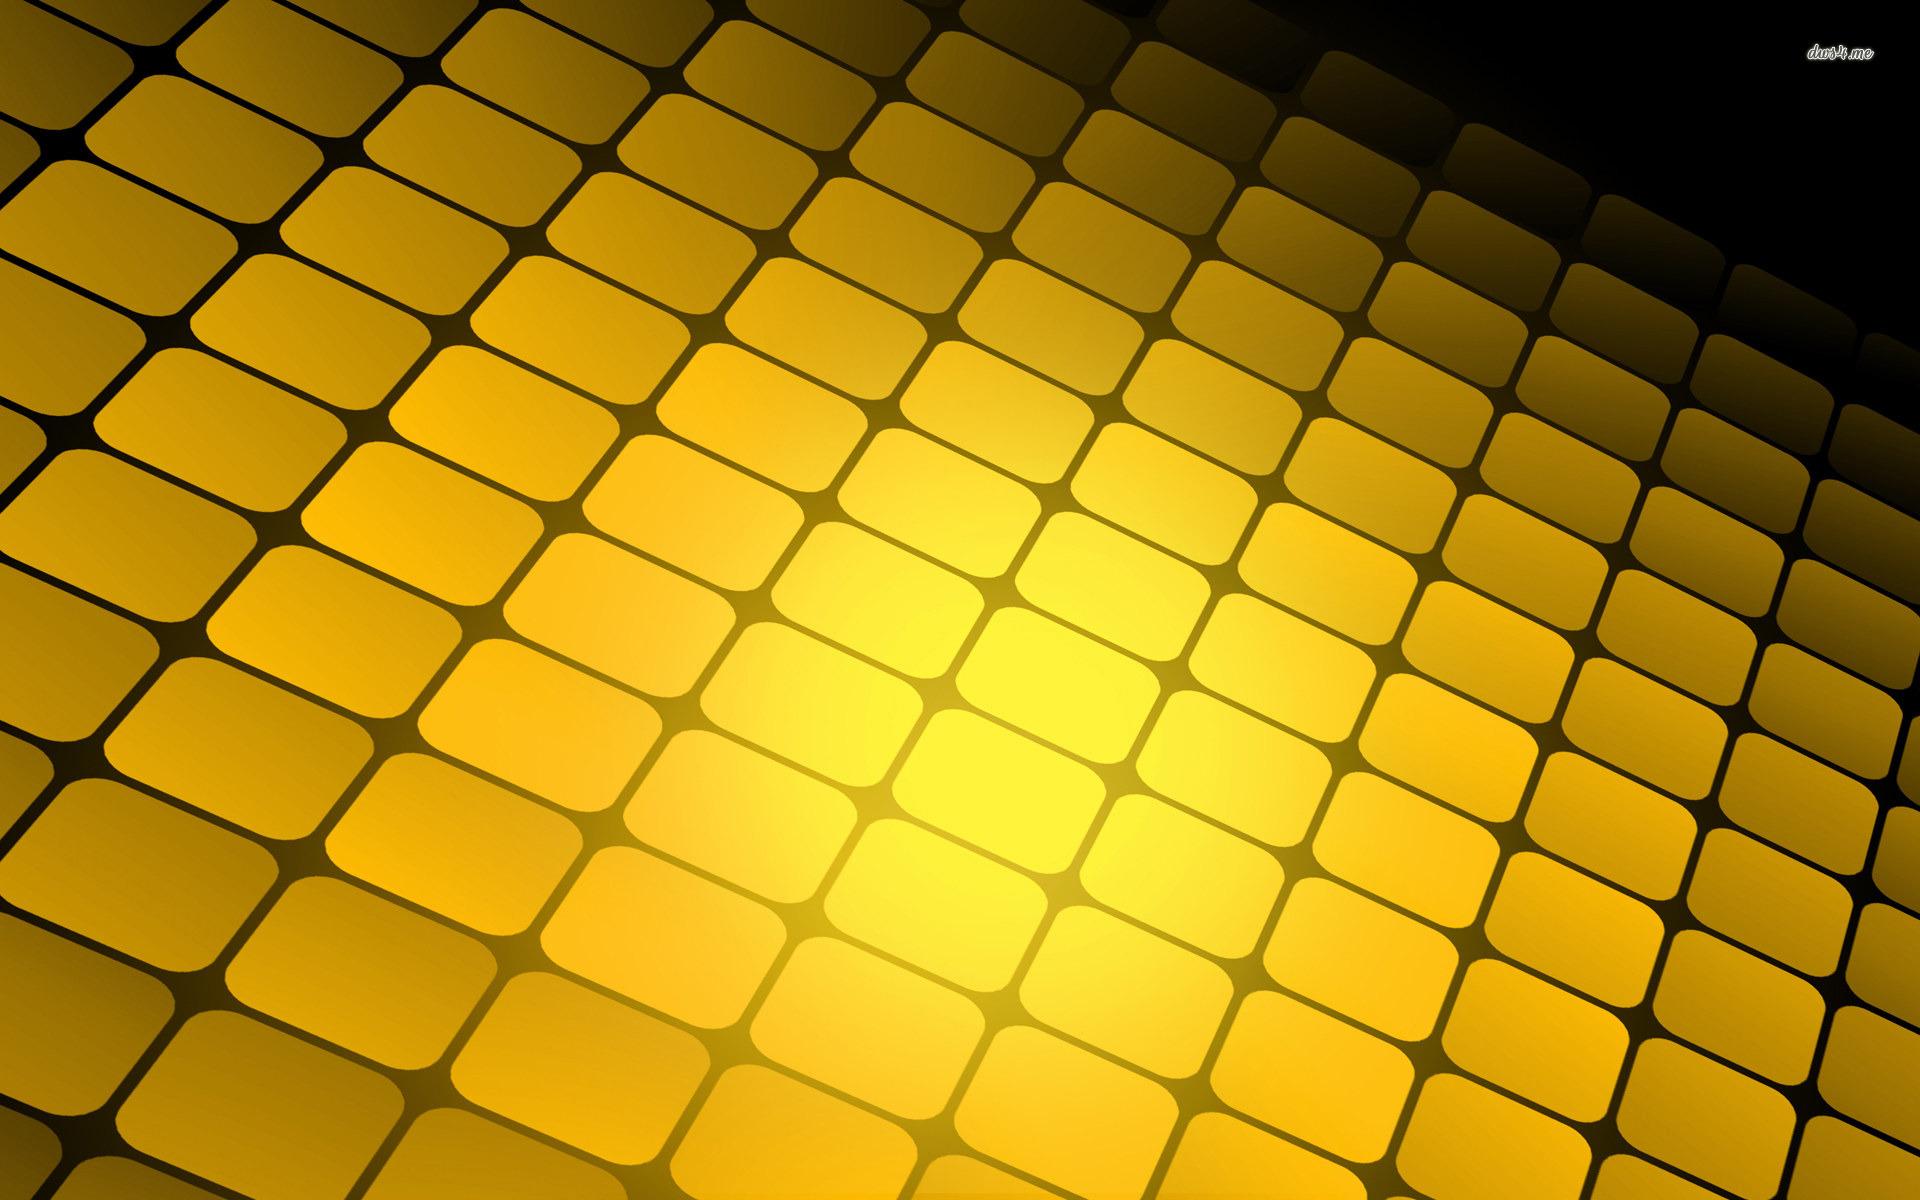 [49+] Summary of Yellow Wallpaper on WallpaperSafari